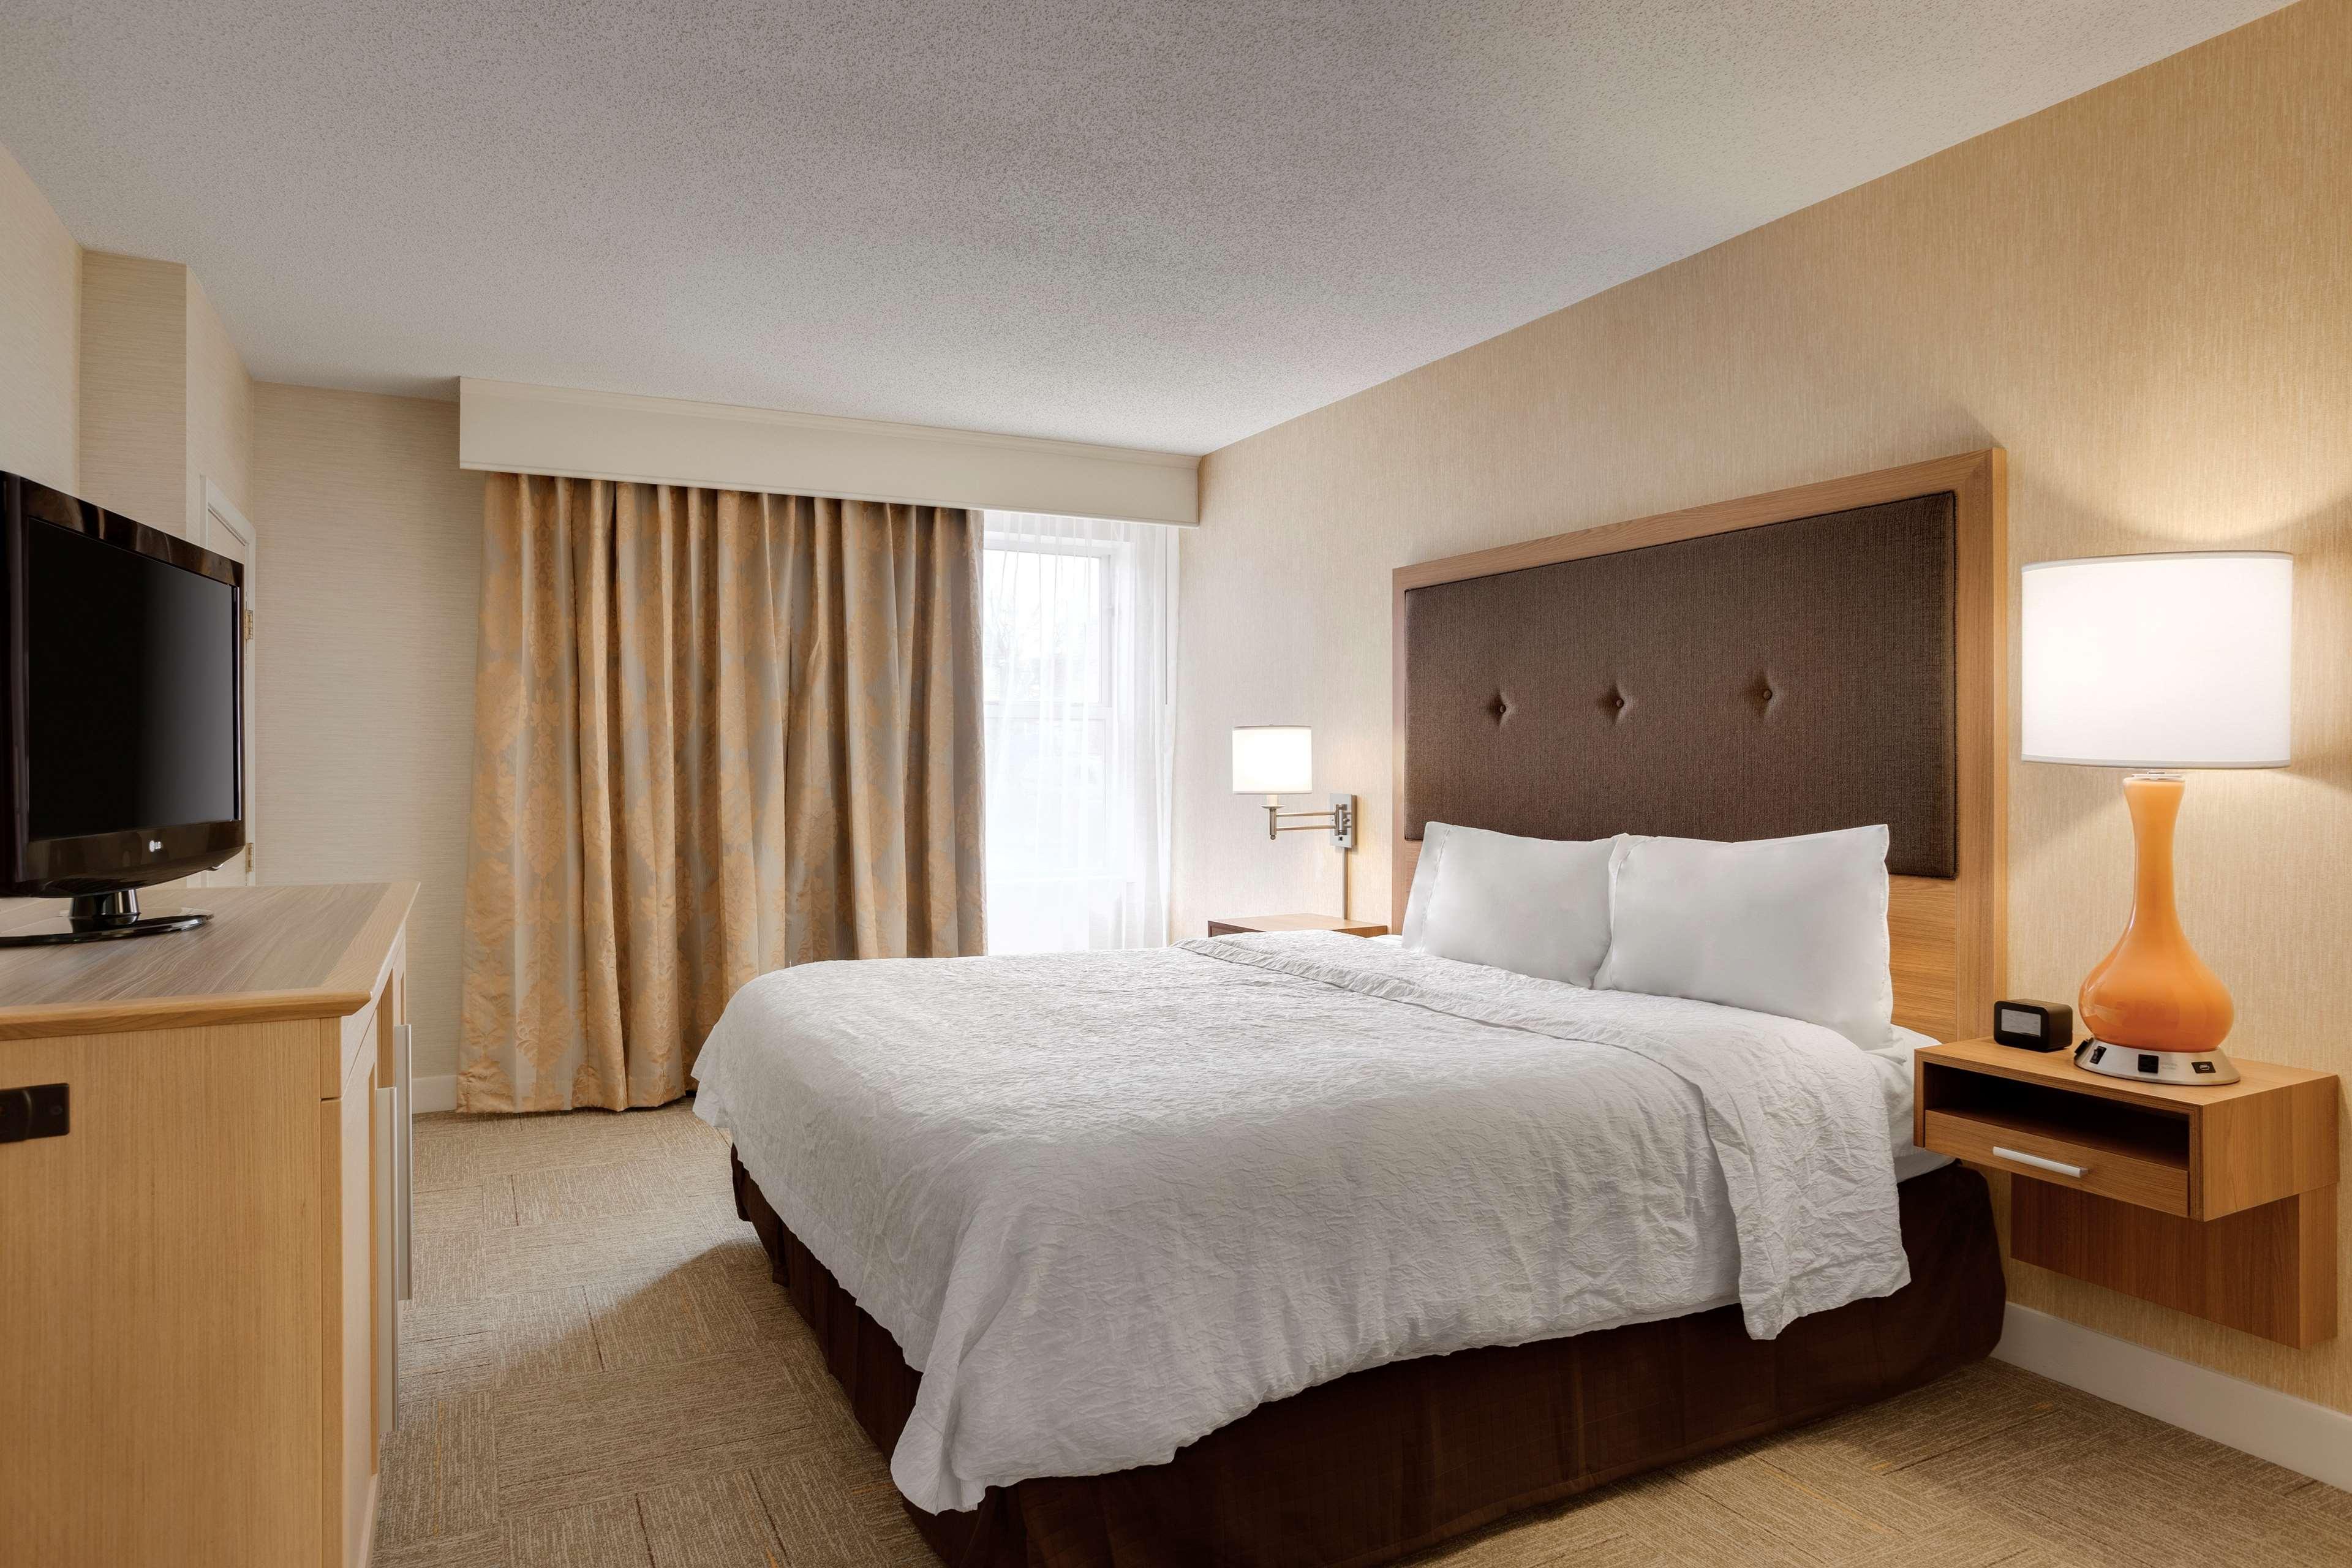 Hampton Inn & Suites Cleveland/Independence image 20